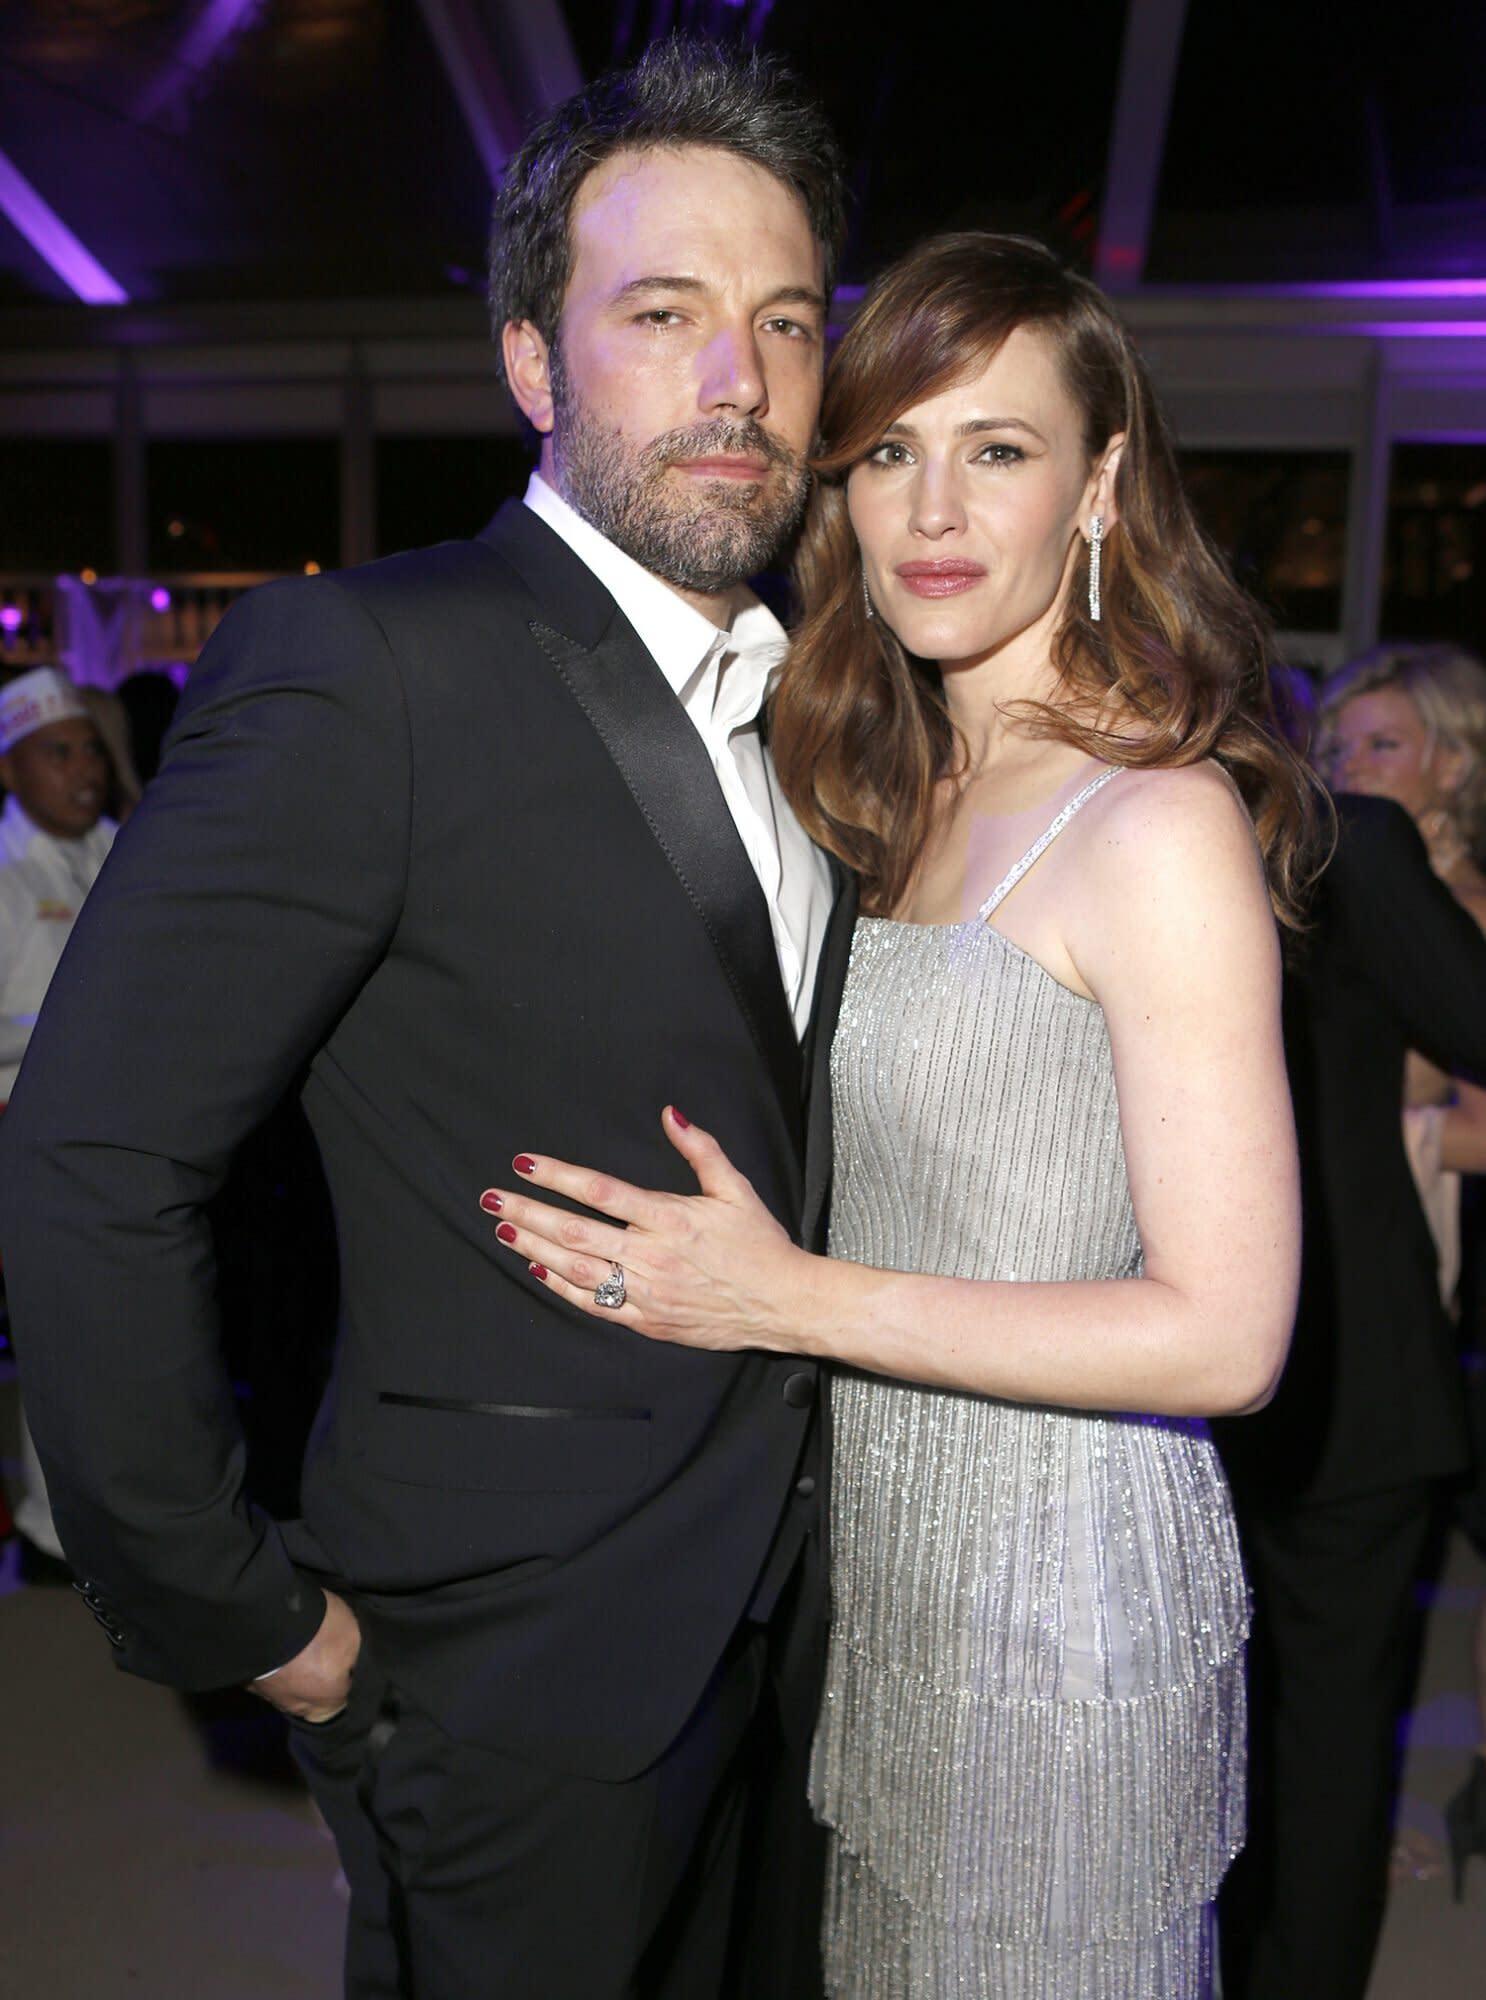 Ben Affleck Shares How His Divorce from Jennifer Garner Has Helped Him Become a Better Actor